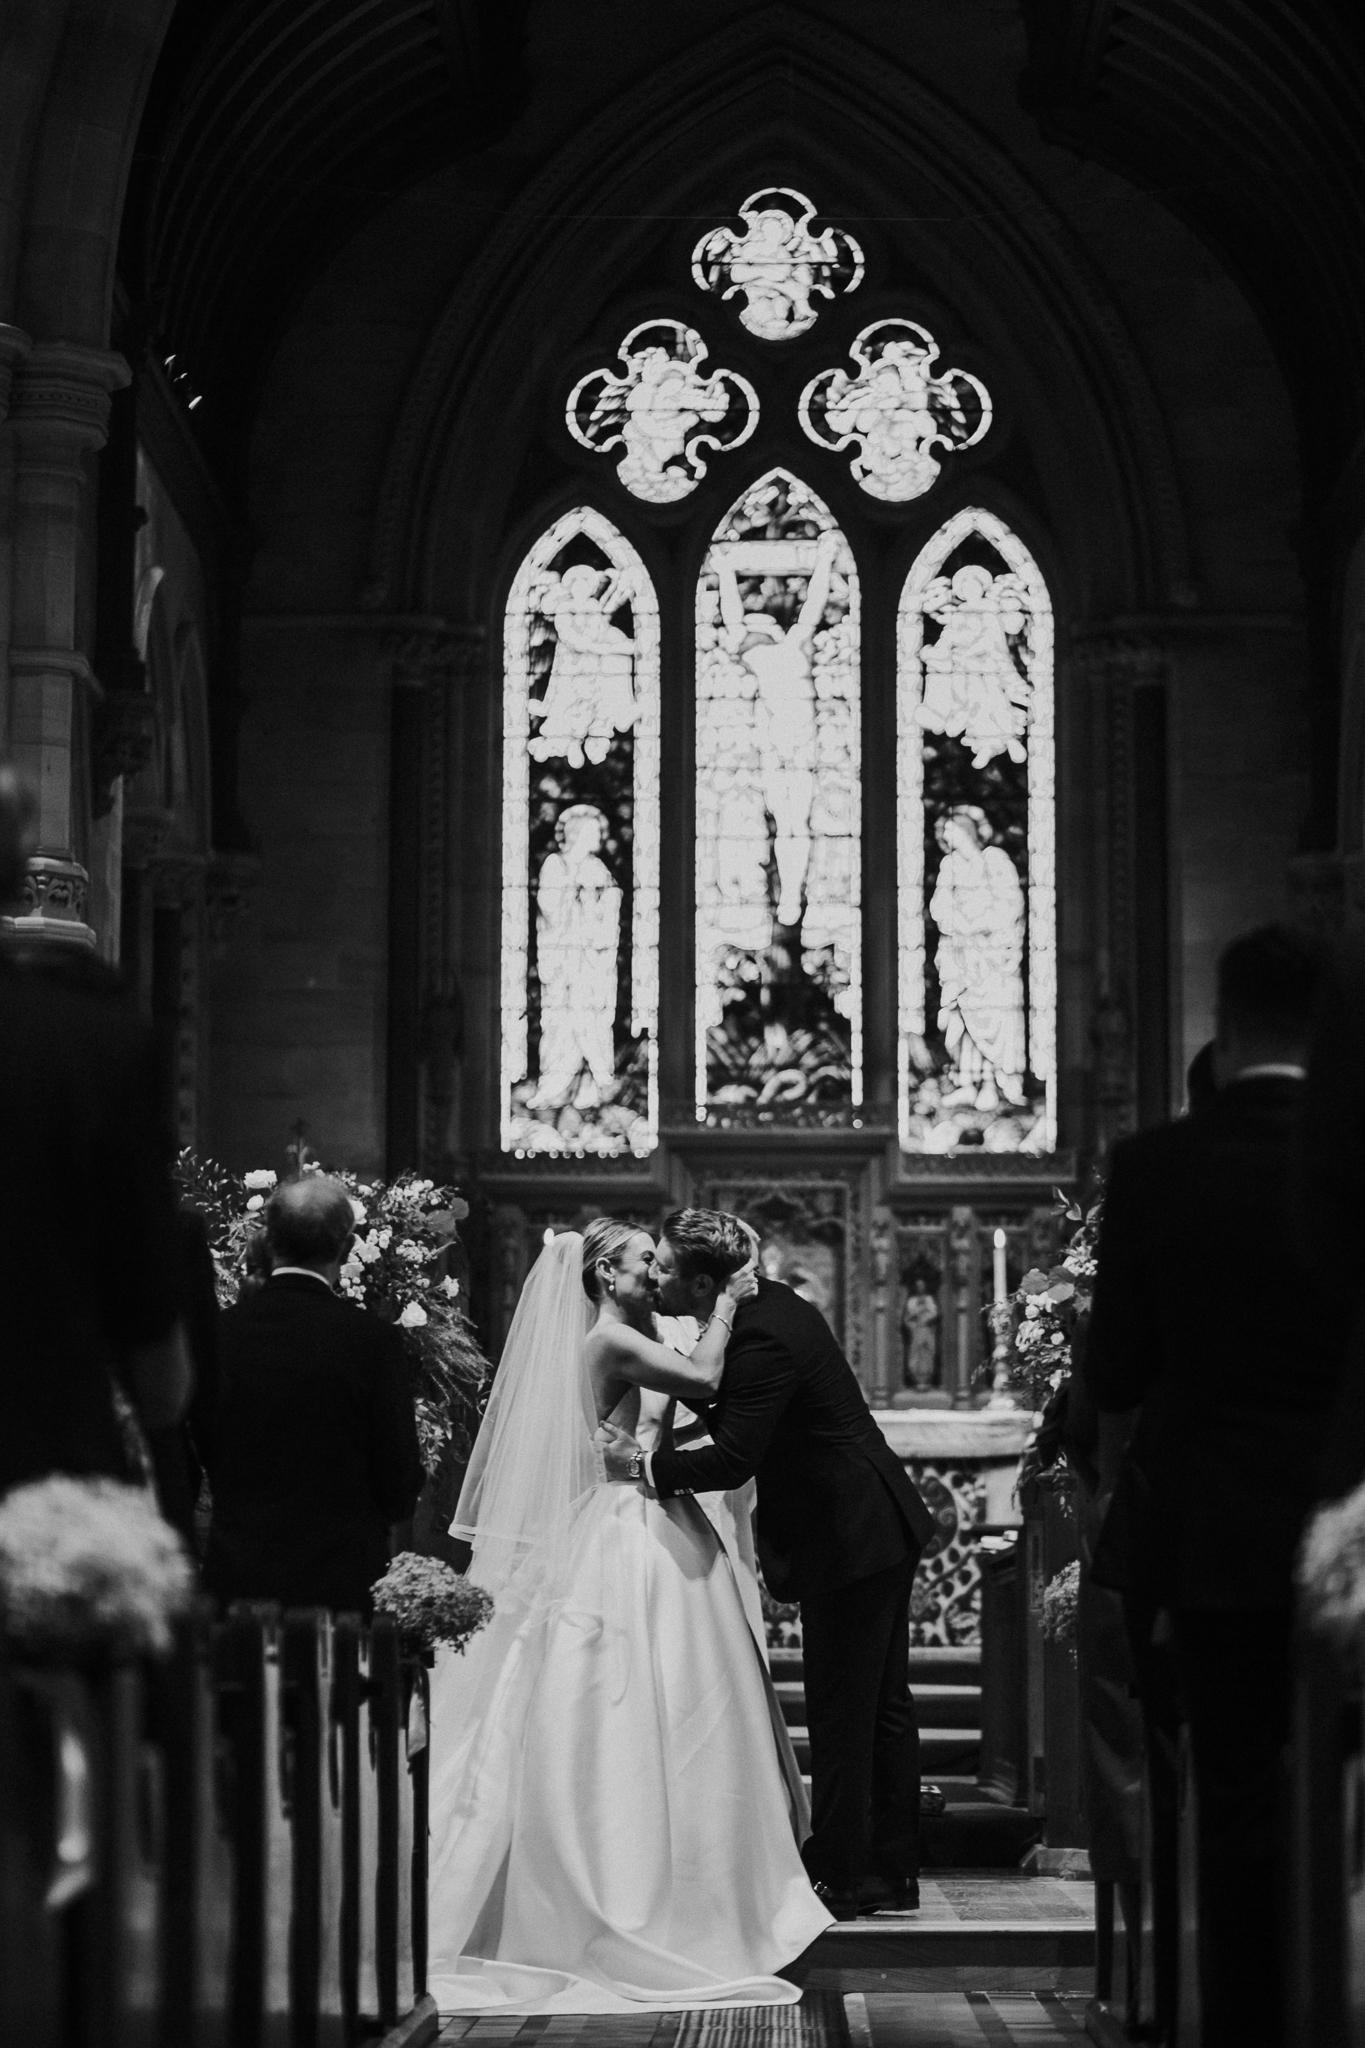 43 Sussex wedding photography fine art stylish joanna nicole photography1.jpg